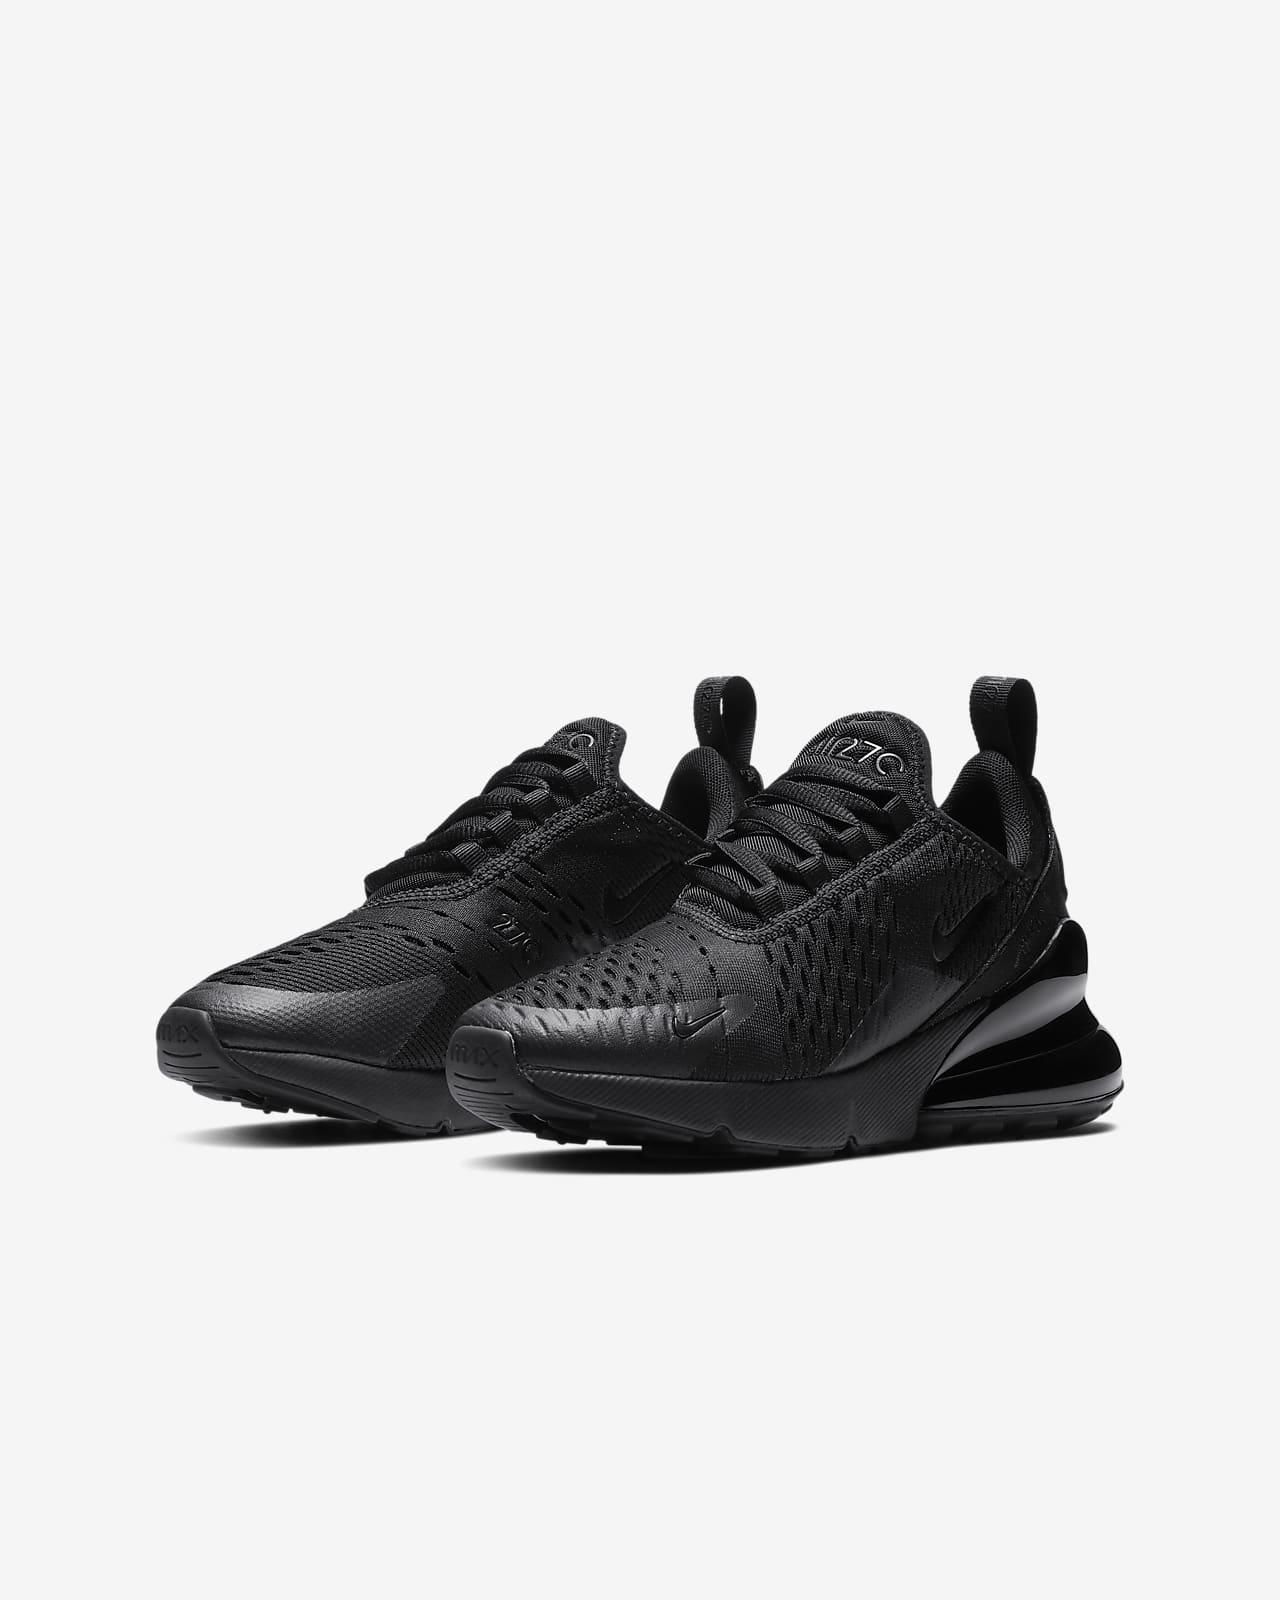 Nike Air Max 270 Older Kids' Shoe. Nike NZ